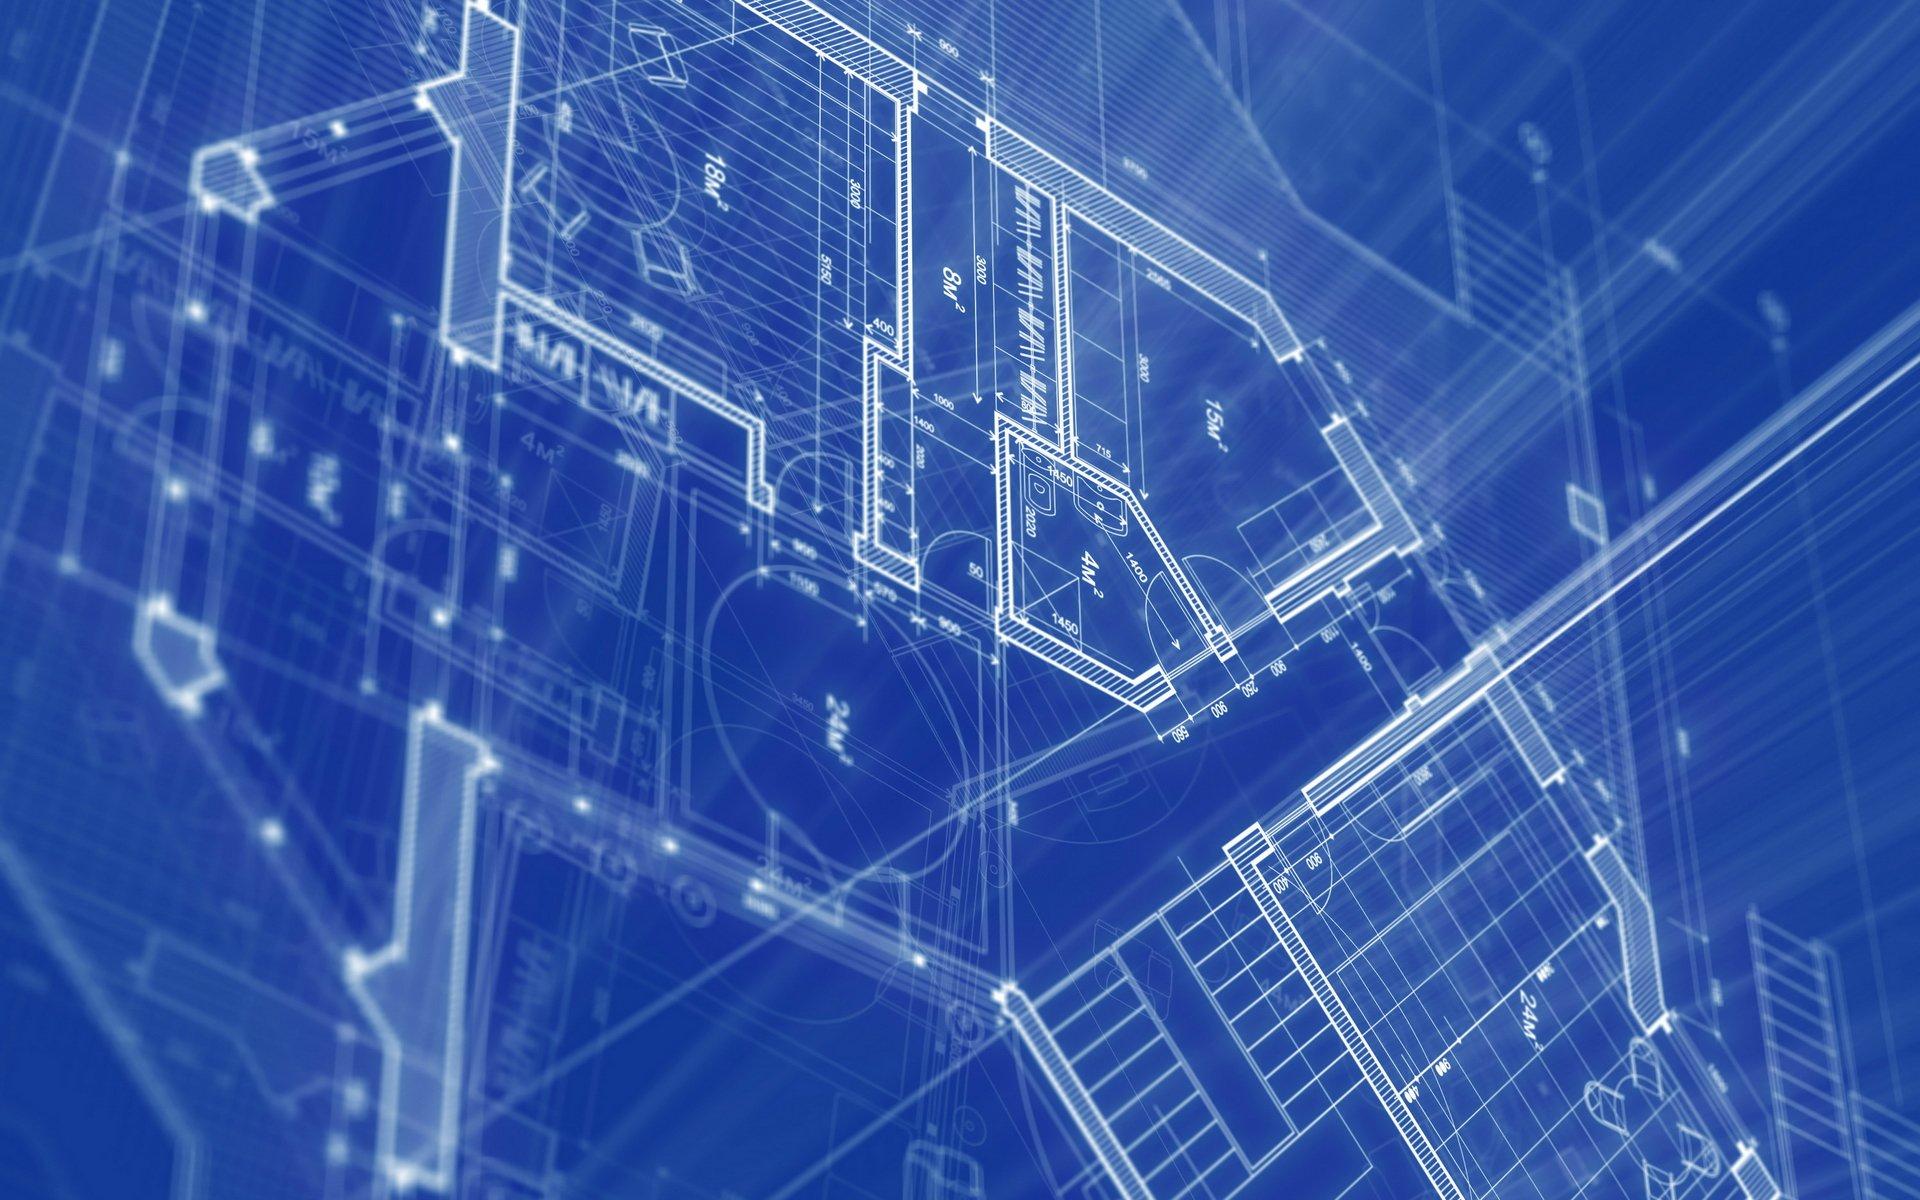 Blueprint Architecture Wallpaper 1920x1200 6700